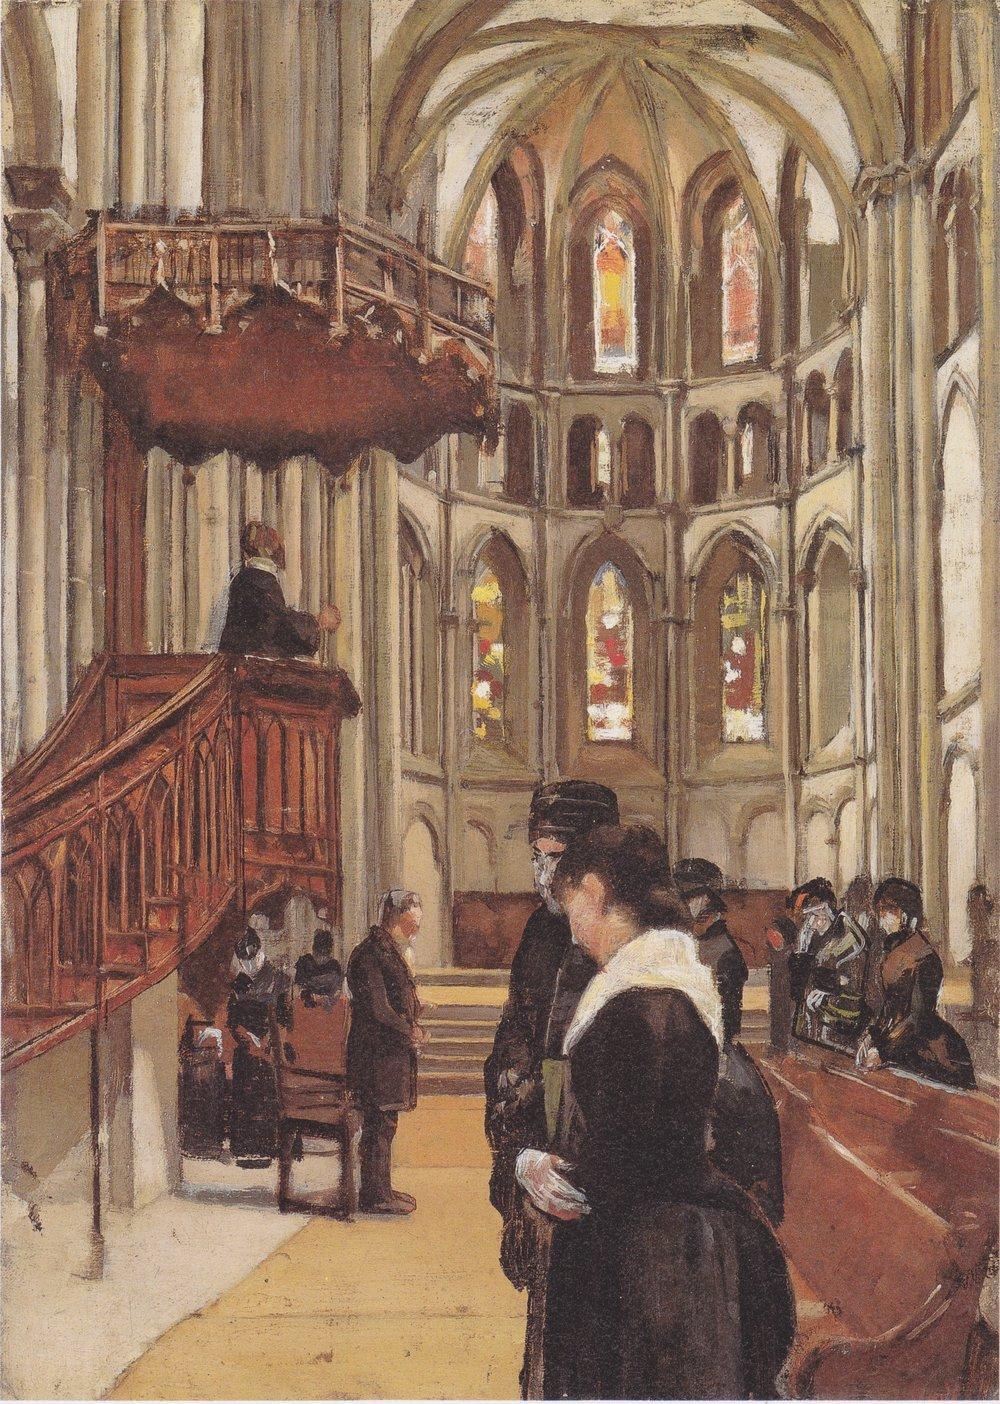 prayer-in-the-saint-pierre-cathedral-in-geneva-1882.jpg